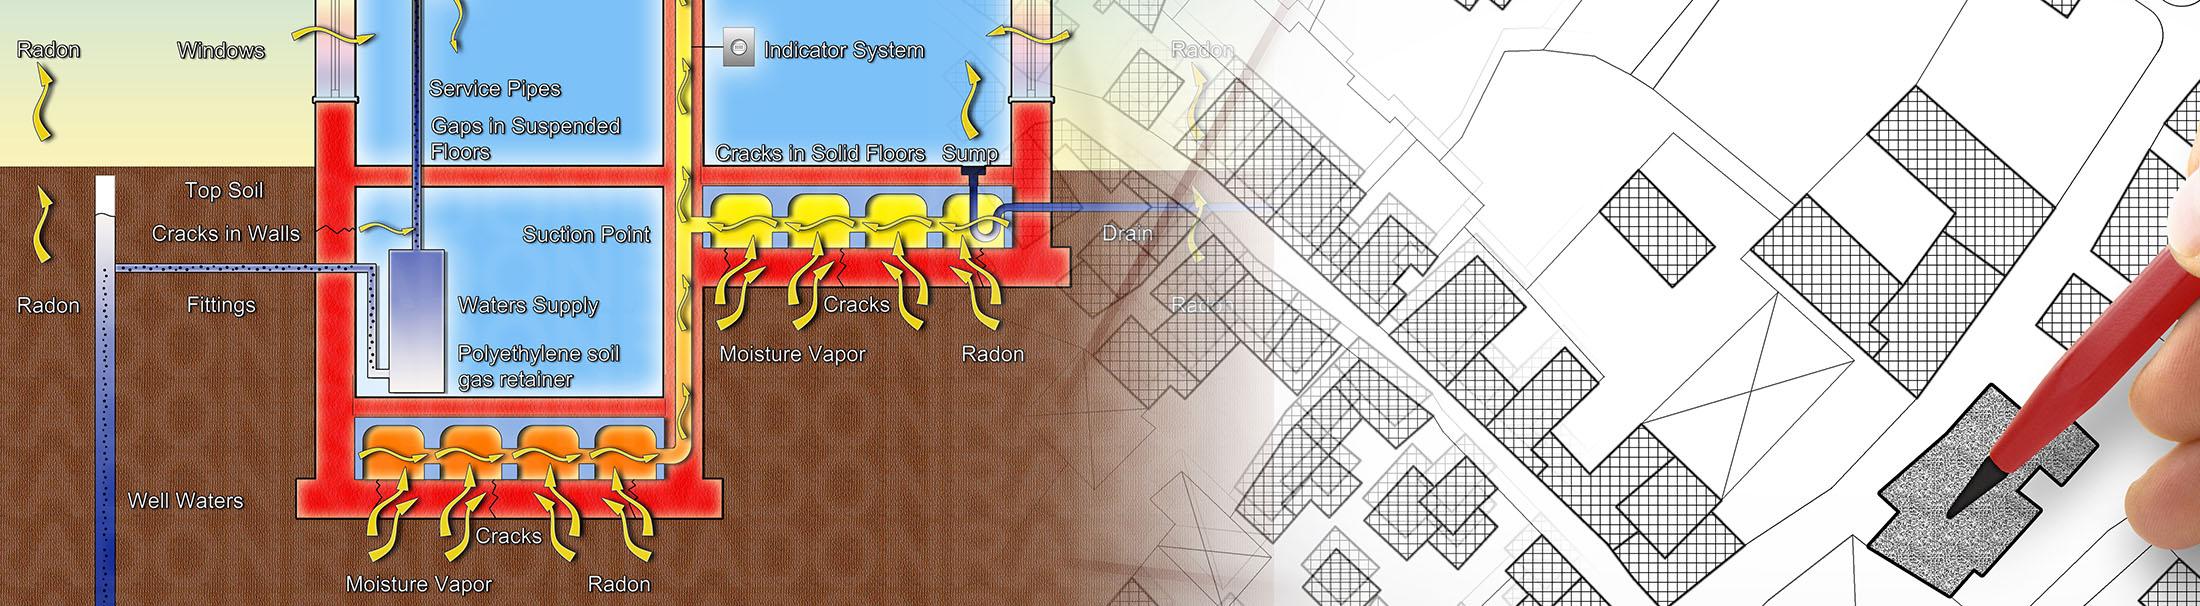 Radon Damage Home Inspection